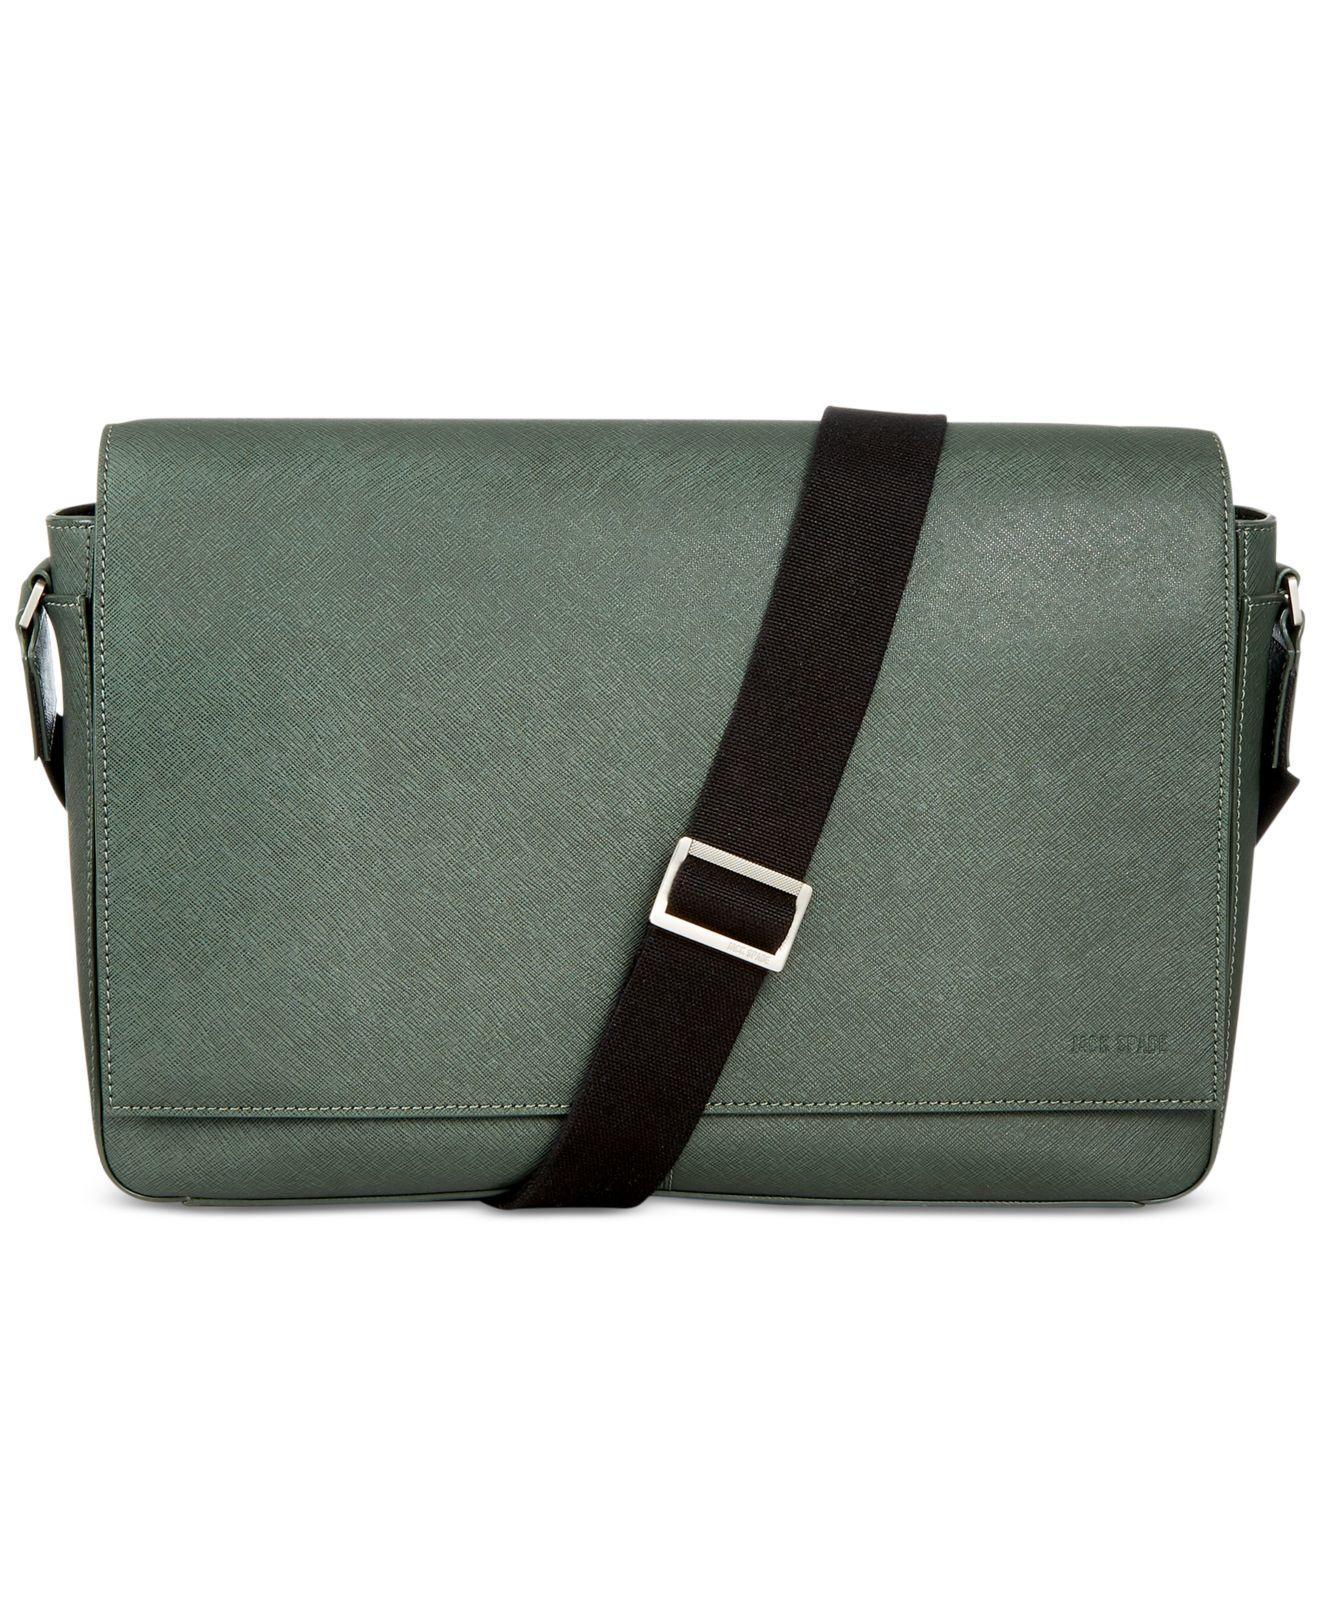 aa10ed289c Lyst - Jack Spade Barrow Urban Messenger Bag in Green for Men